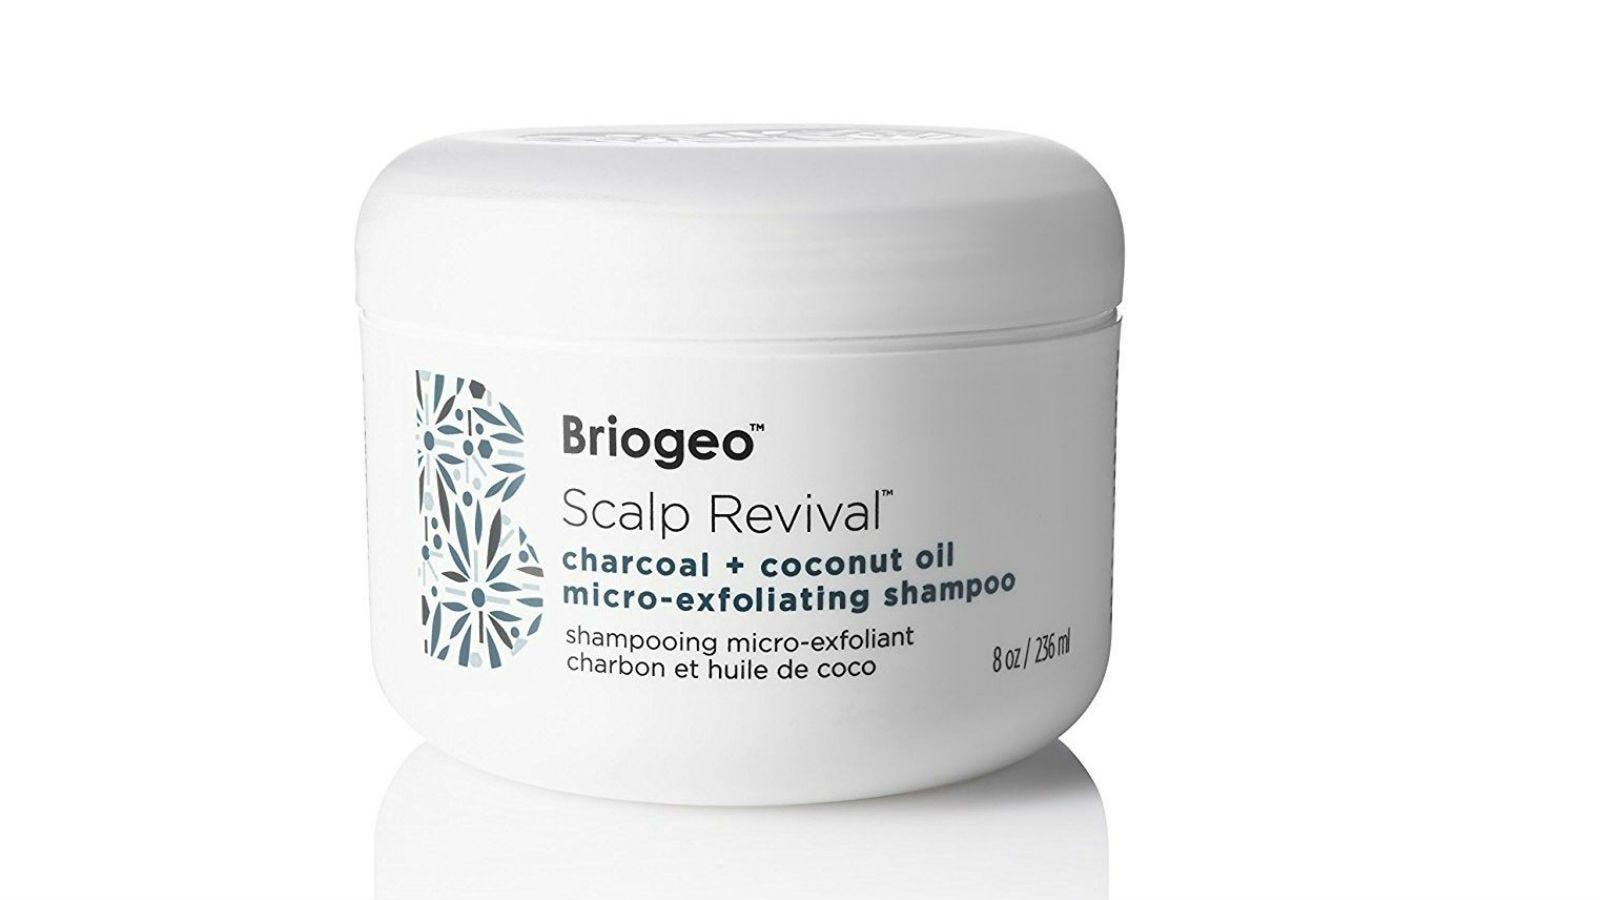 A jar of Briogeo Scalp Revival Charcoal + Coconut Oil Micro-Exfoliating Shampoo.